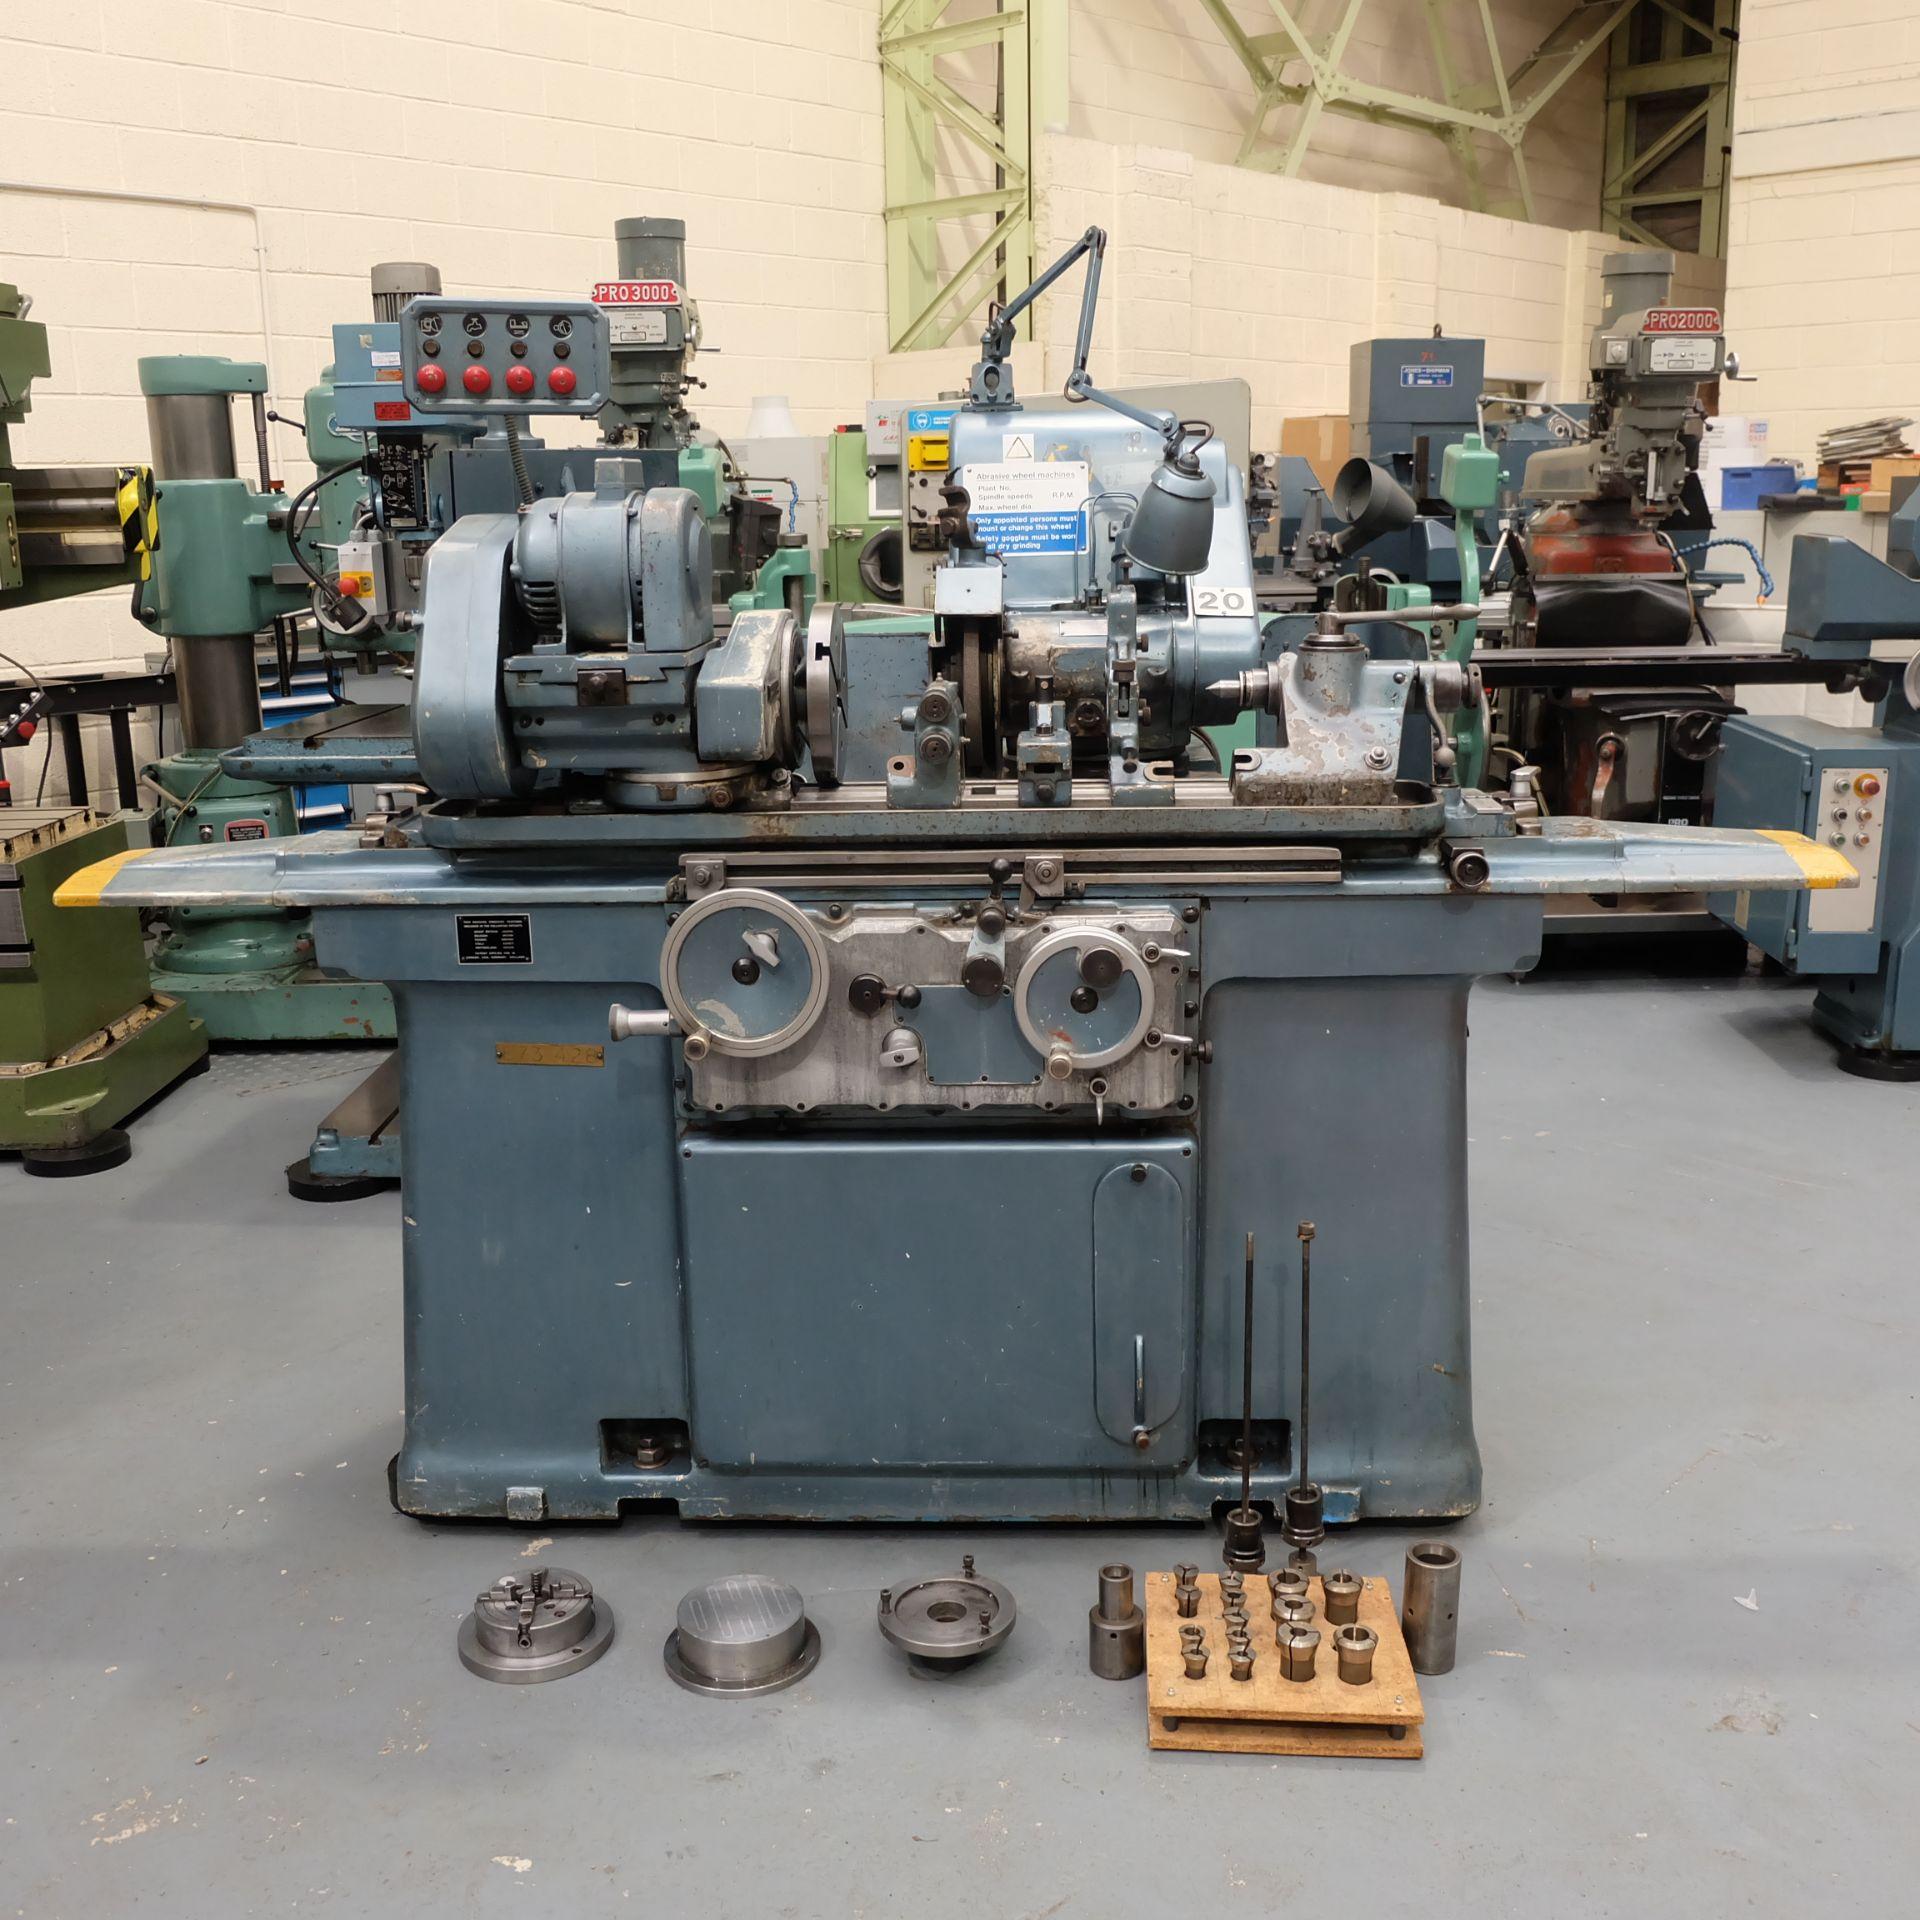 "Jones & Shipman Type 1311 Universal Cylindrical Grinder. 24"" x 10"" Capacity. - Image 2 of 11"